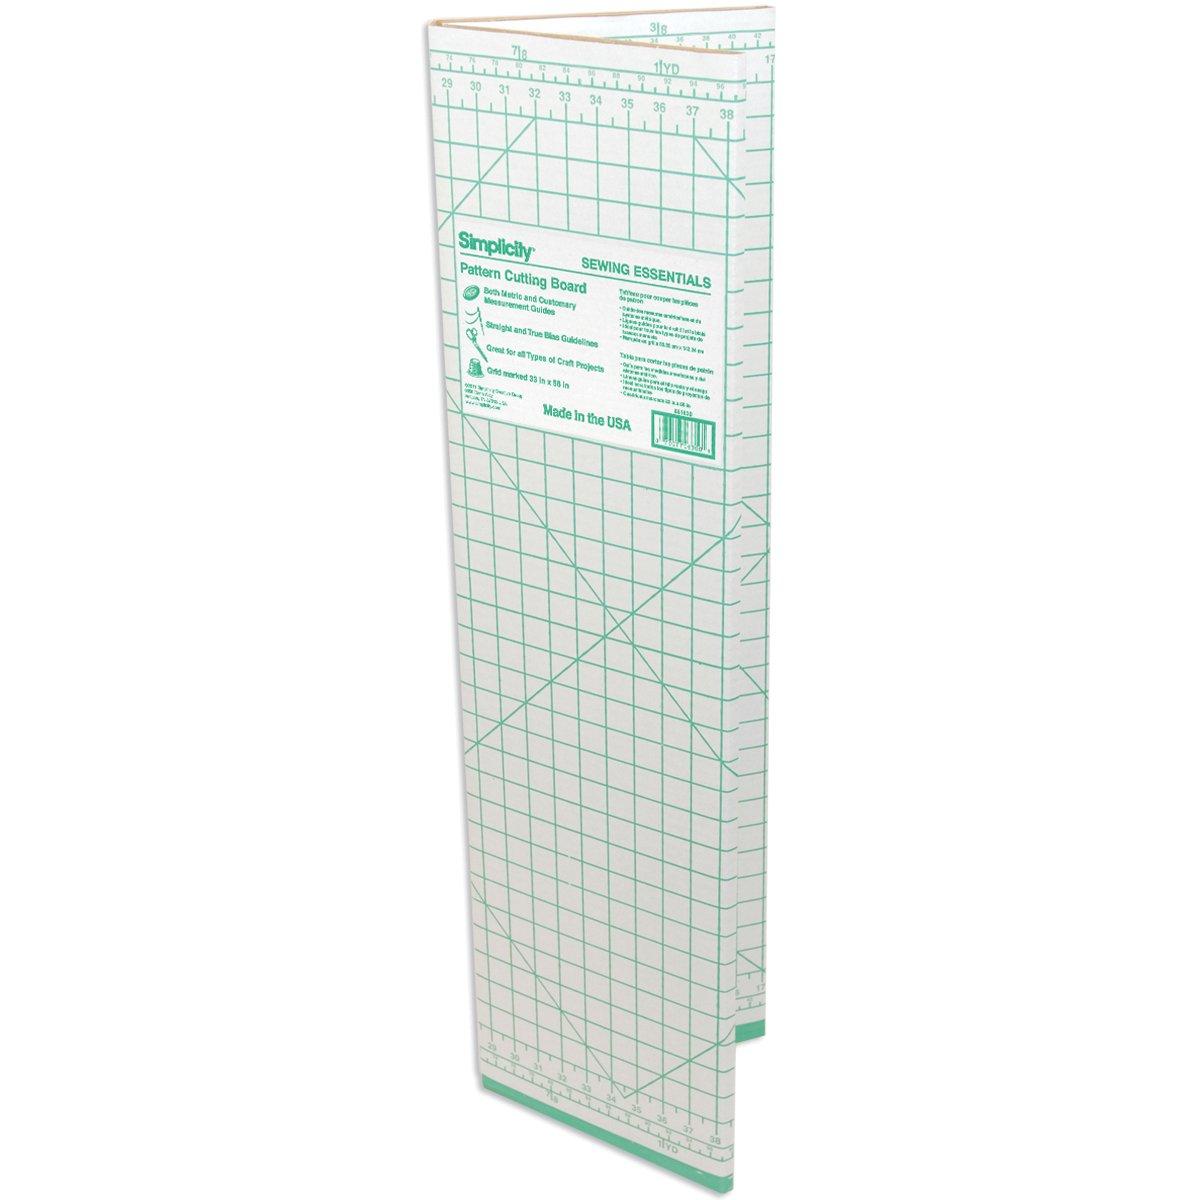 Wrights 881630 Cardboard Pattern Cutting Board, 36''x60''